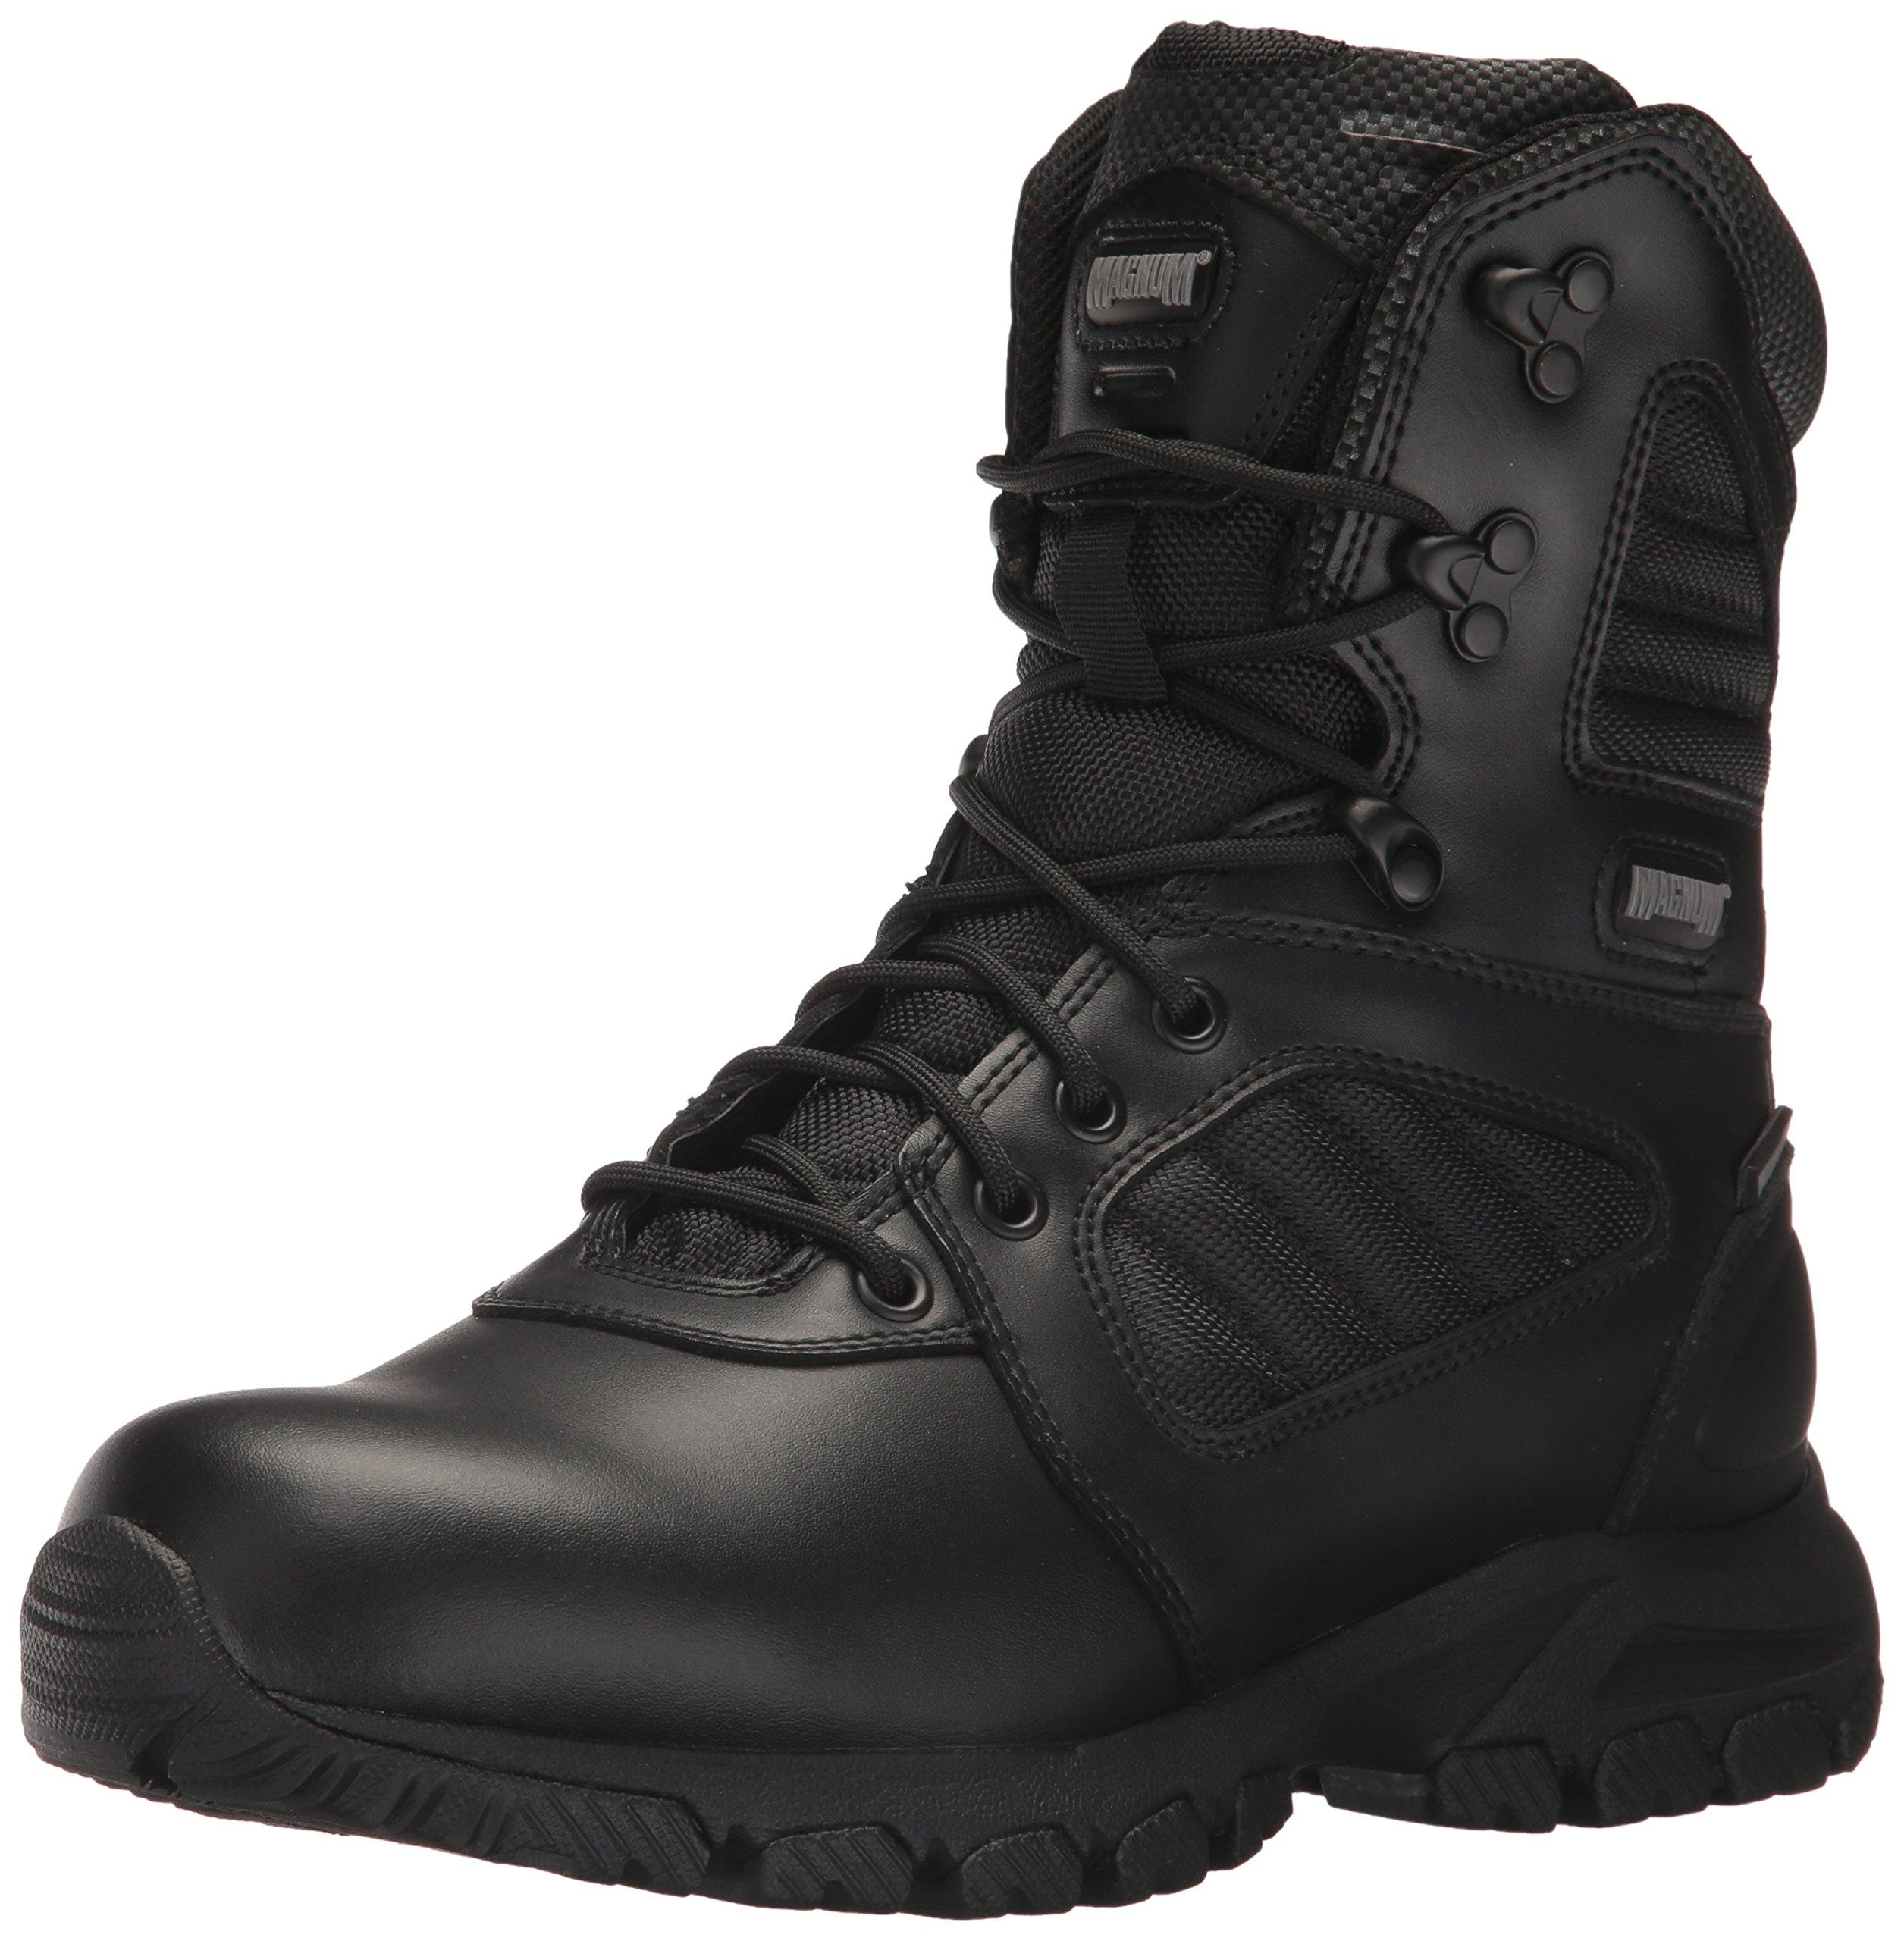 Magnum Men's Response III 8.0 Waterproof Military and Tactical Boot, Black, 7 M US